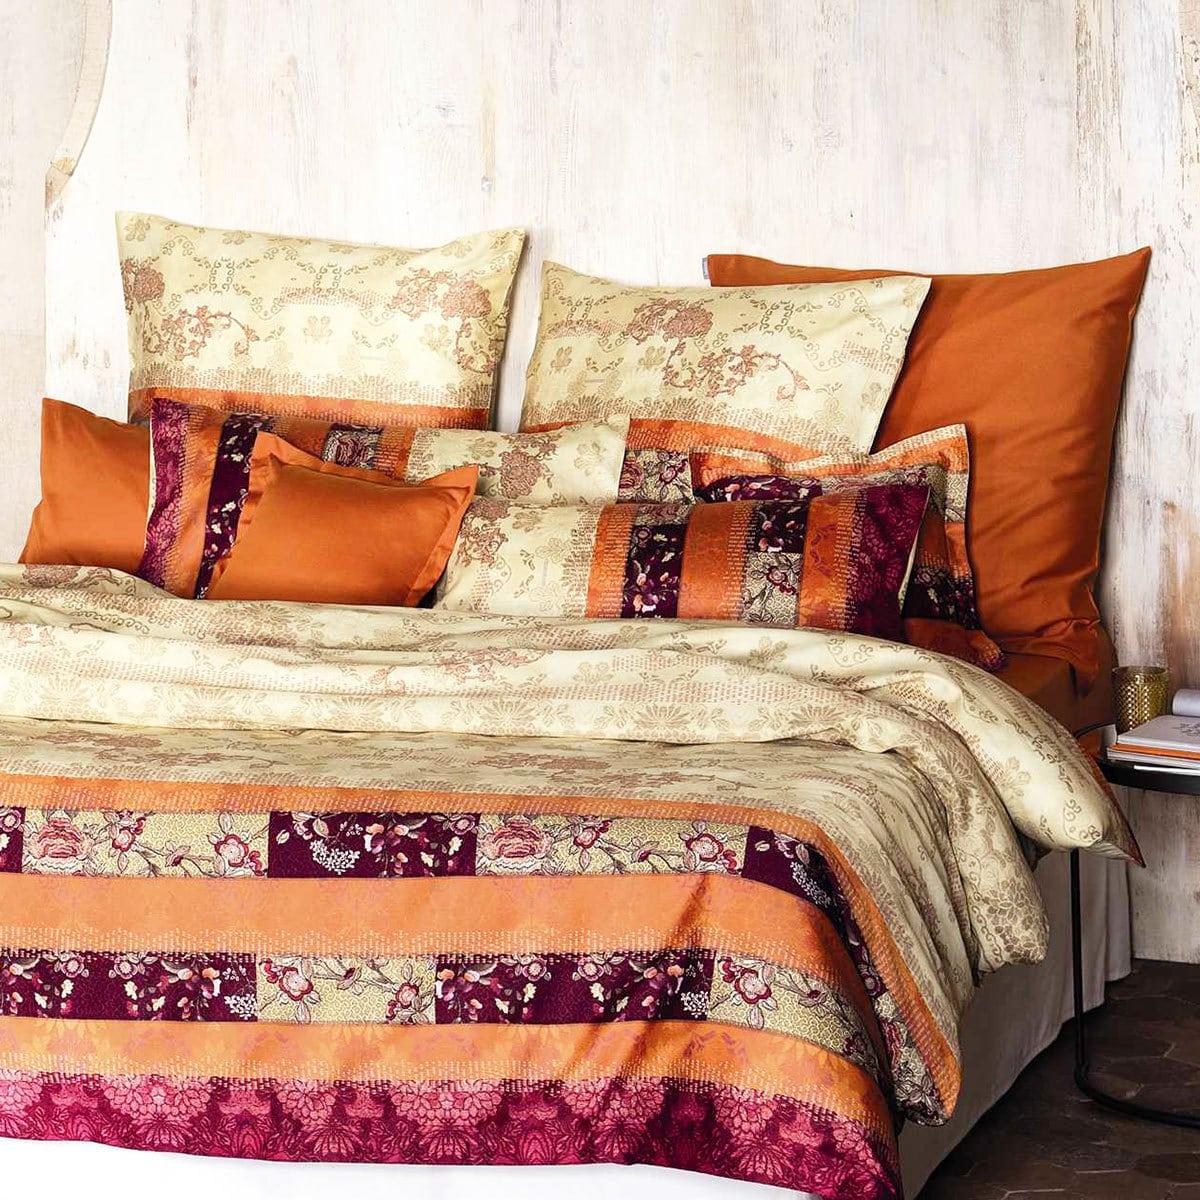 bassetti mako satin bettw sche ghirlandaio v9 g nstig. Black Bedroom Furniture Sets. Home Design Ideas